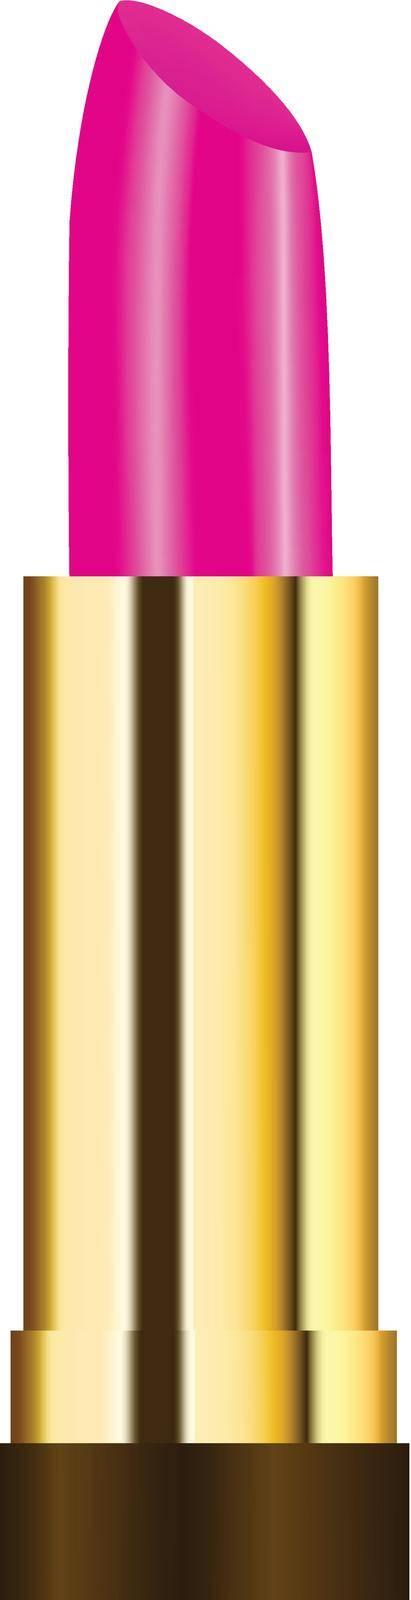 Pink lipstick with golden case. Makeup decoration element.